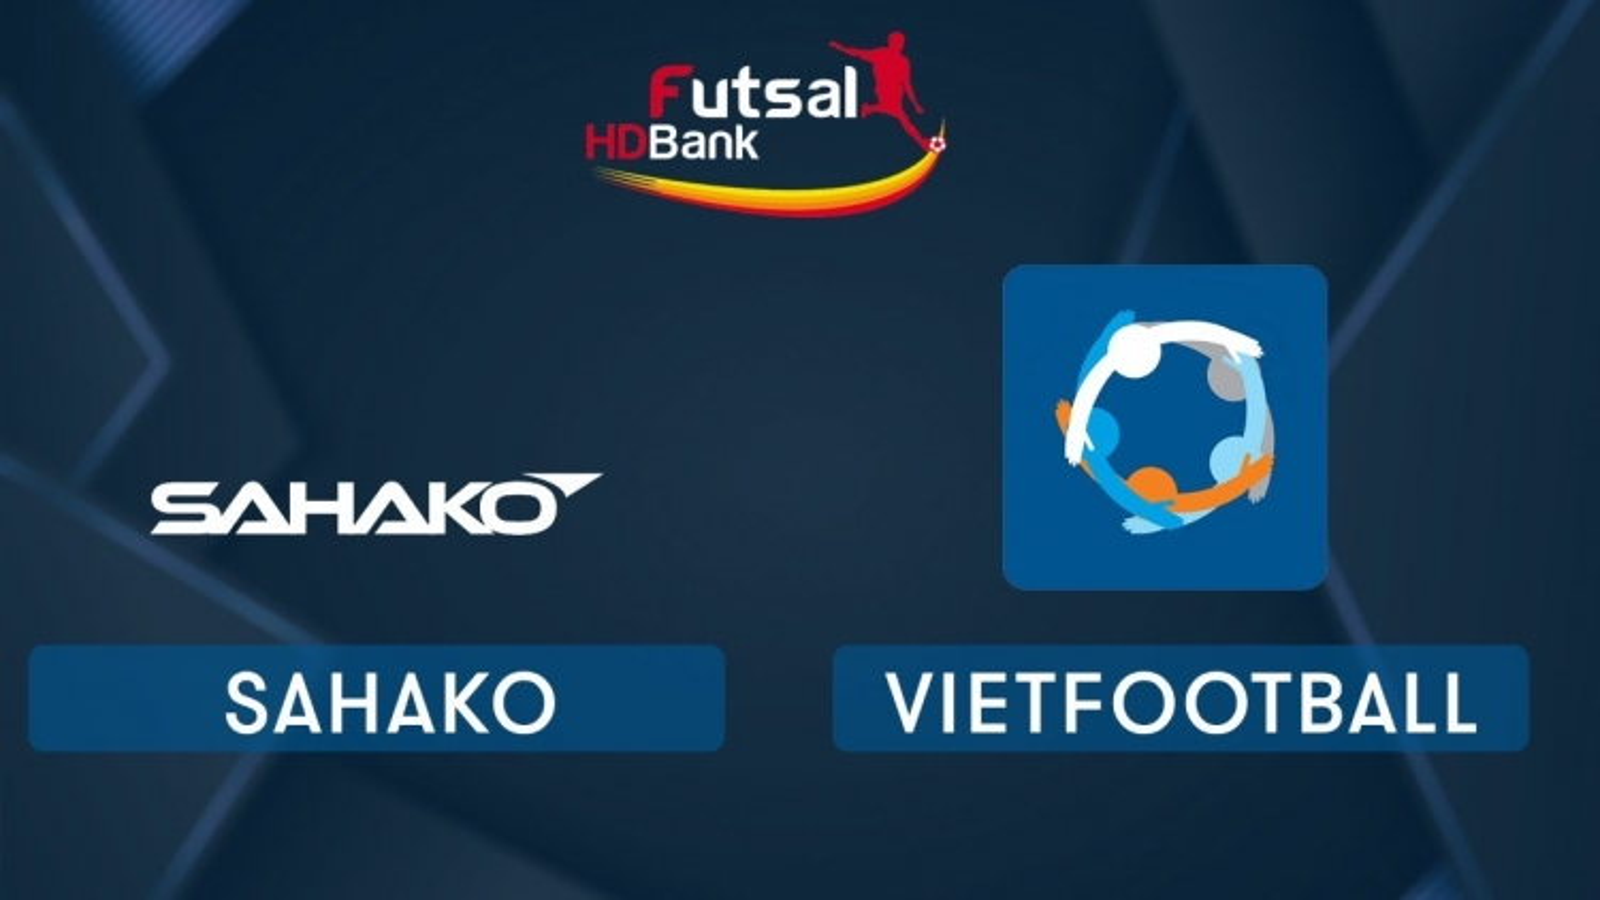 TRỰC TIẾP Sahako vs Vietfootball tại Giải Futsal HDBank 2020